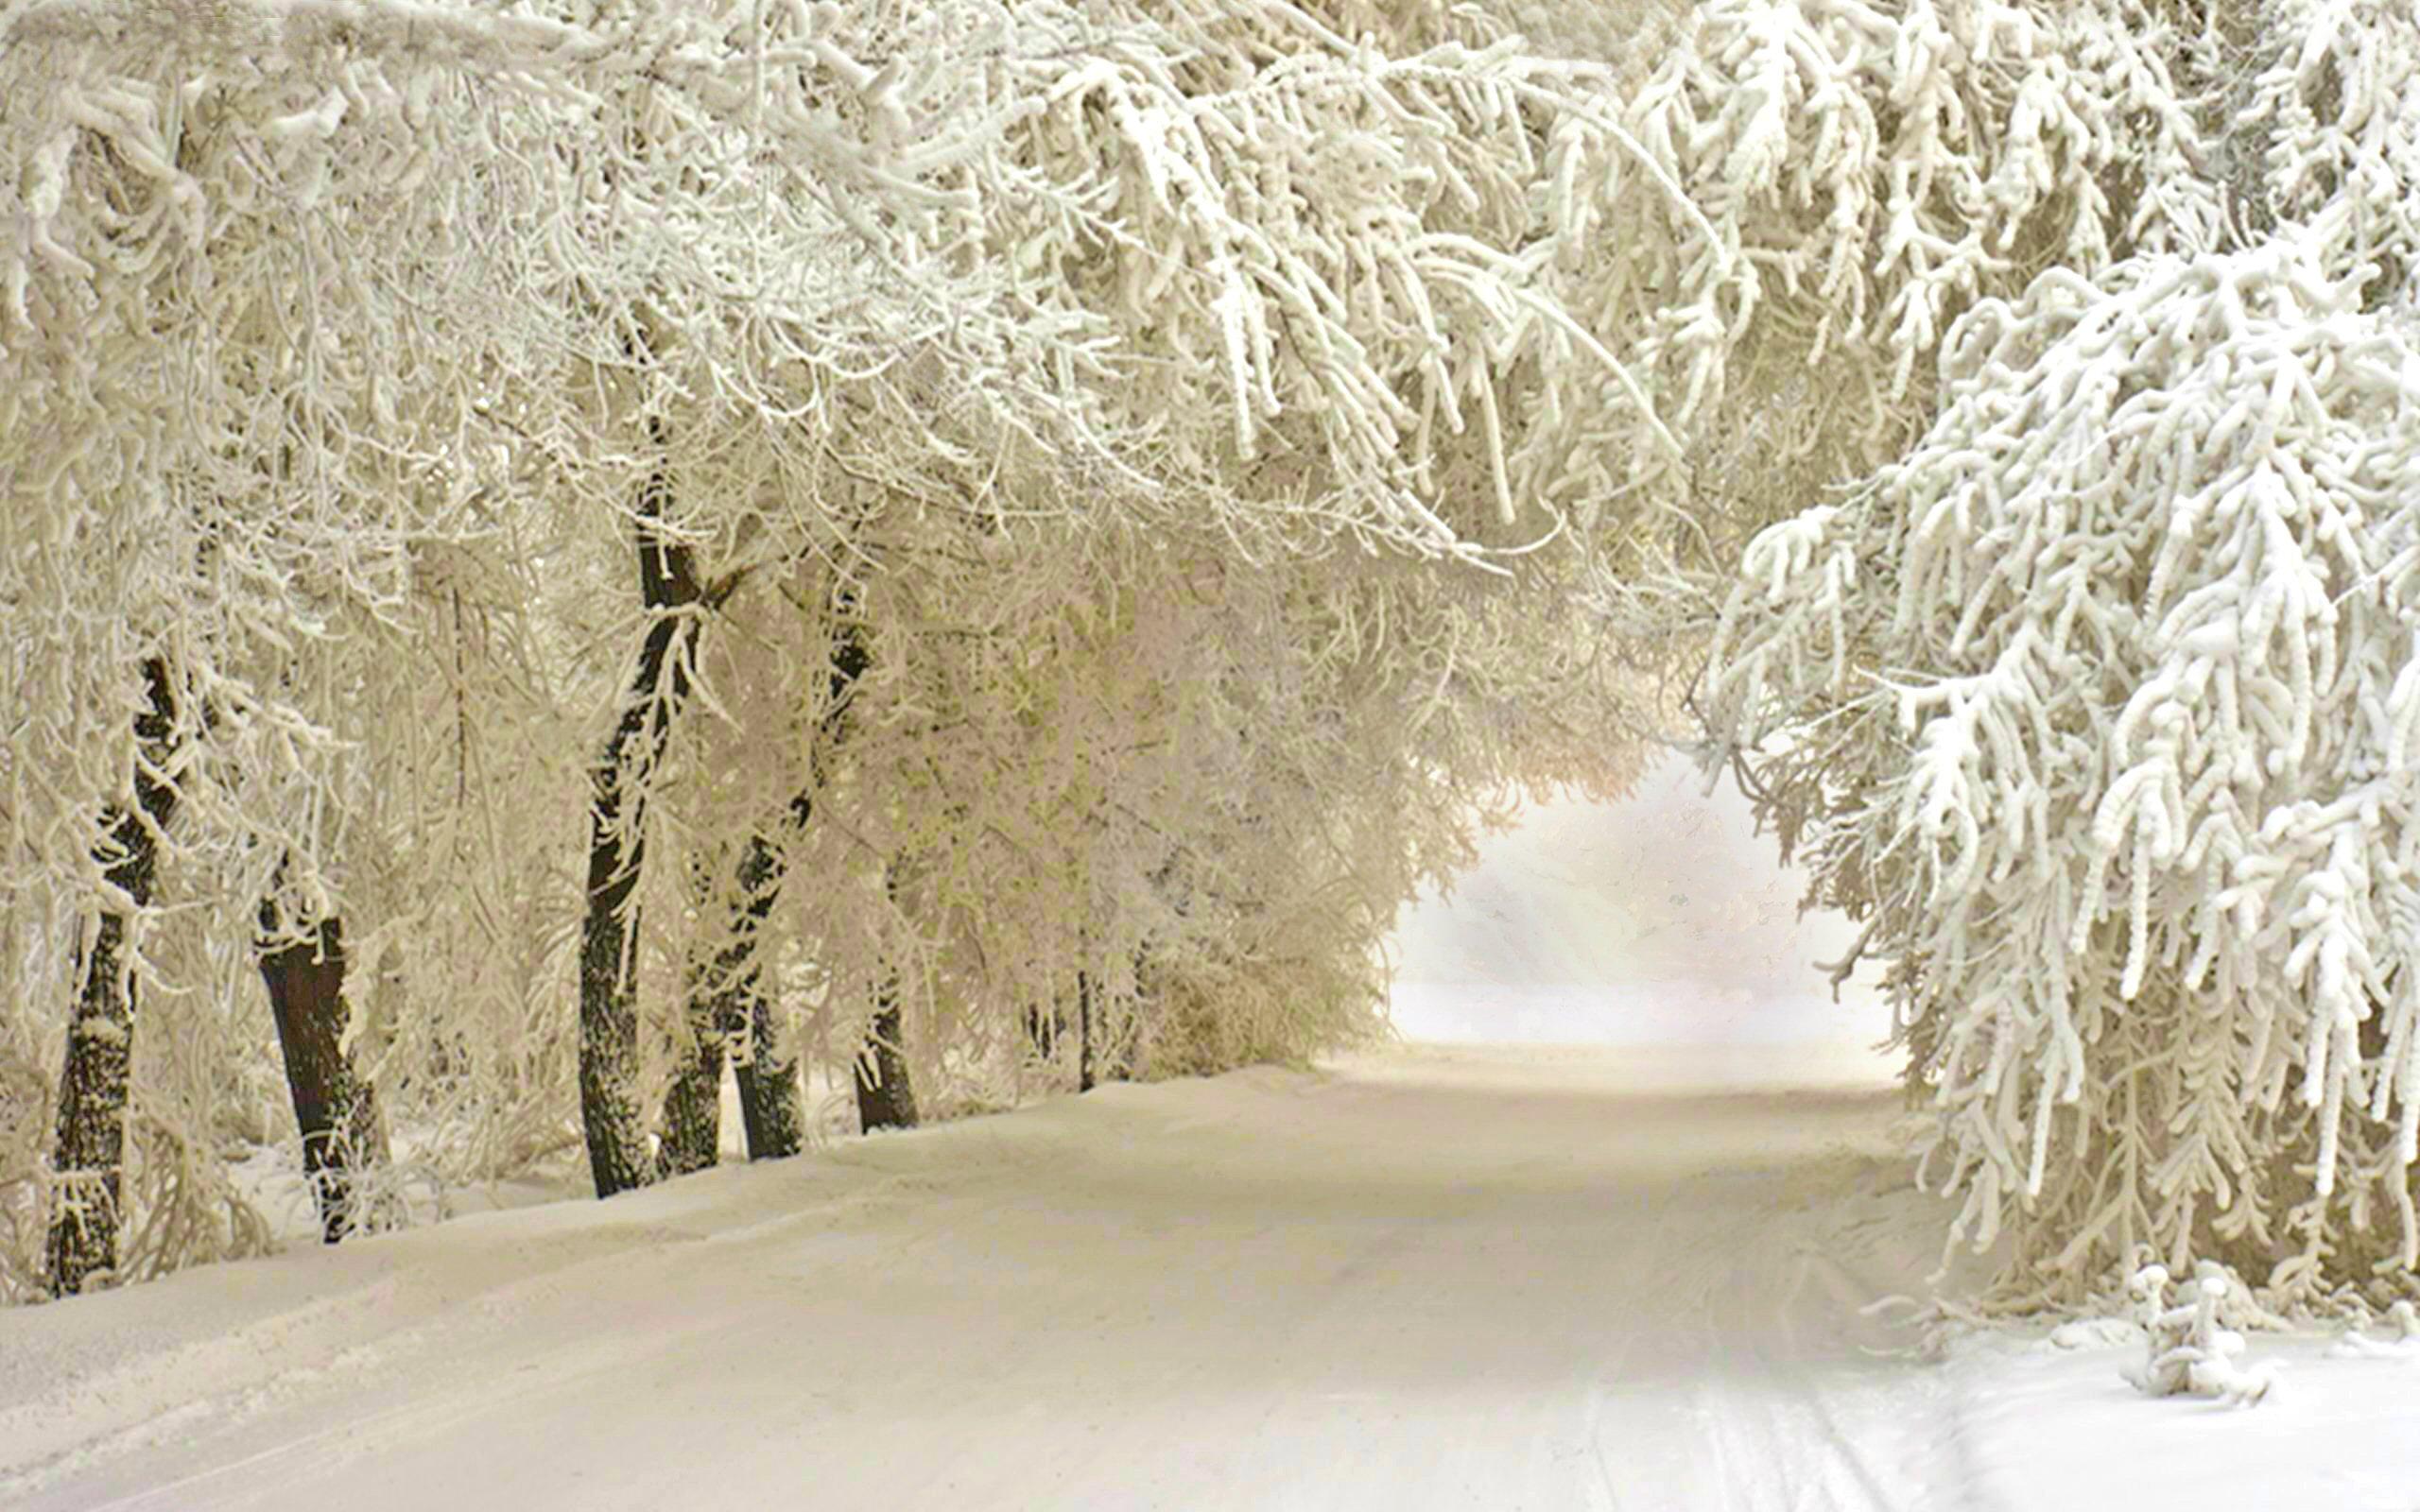 Iphone 5 Falling Snow Wallpaper Winter 03 Wonderland Road 15februari2015sunday 012847